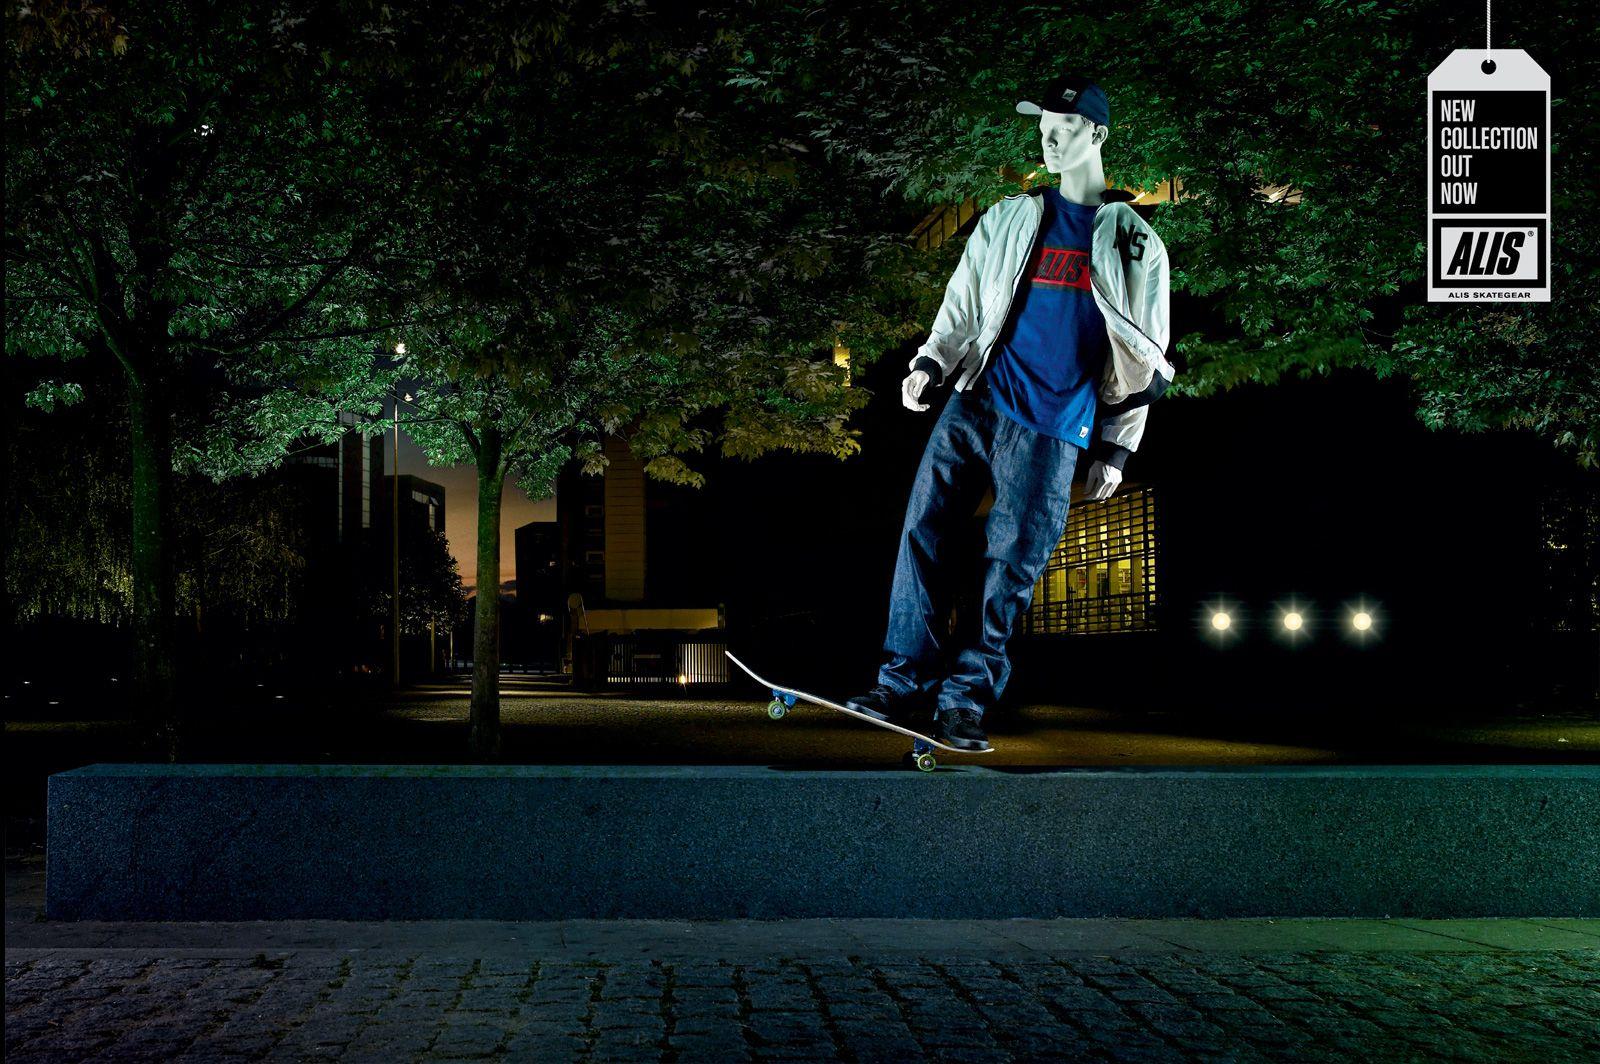 skate advertising - Pesquisa Google